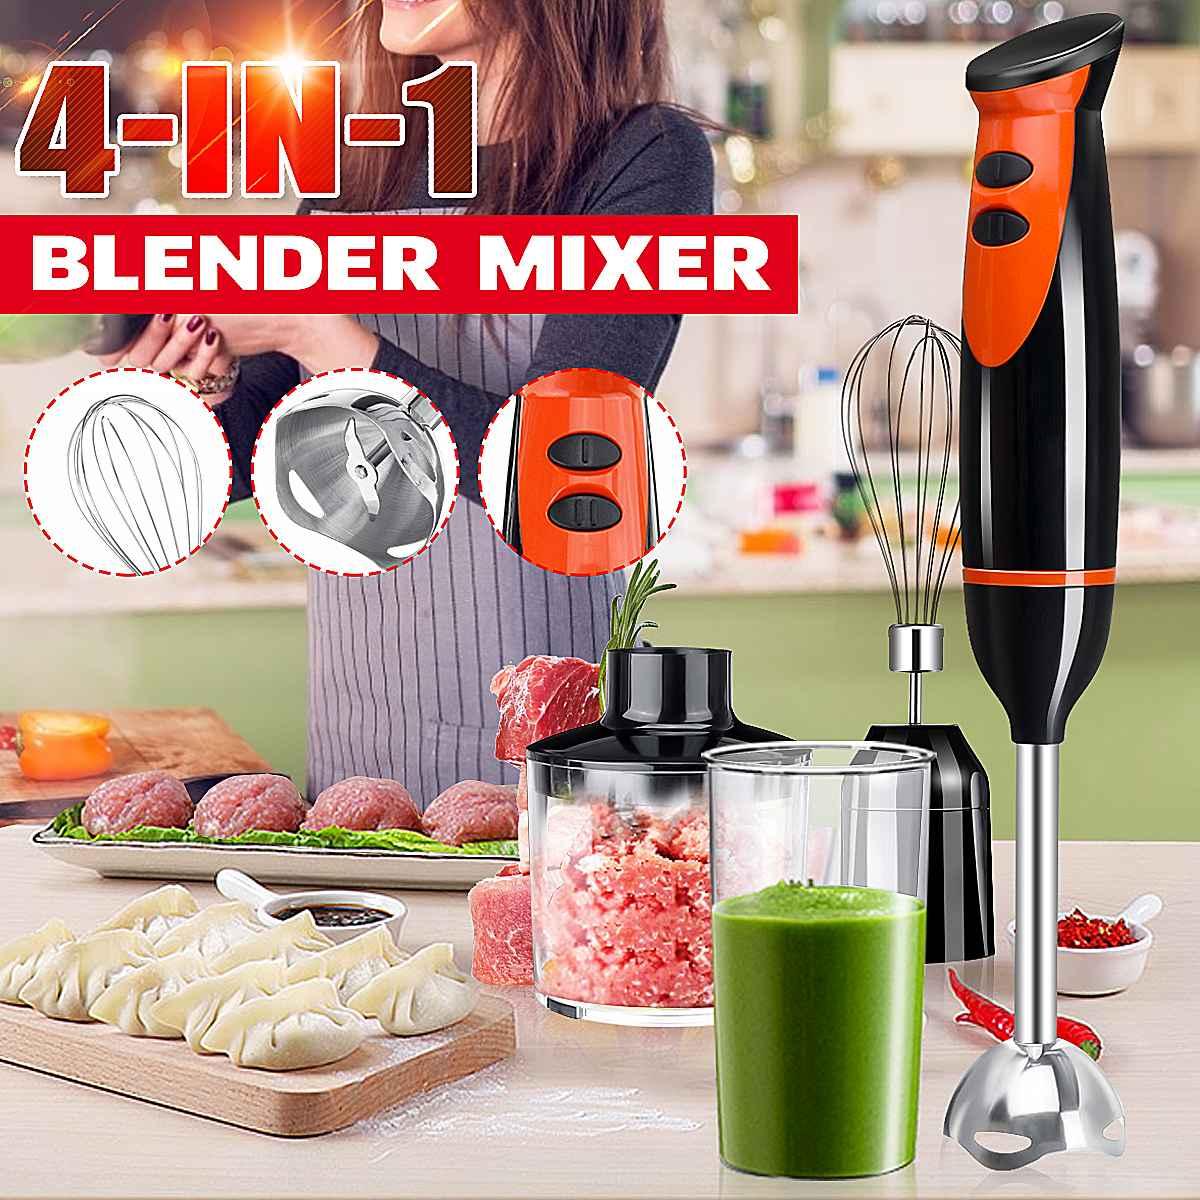 220V 4-in-1 Stainless Steel Handheld Blender Mixer Vegetable Meat Grinder Beef Detachable Egg Beater Electric Food Processor